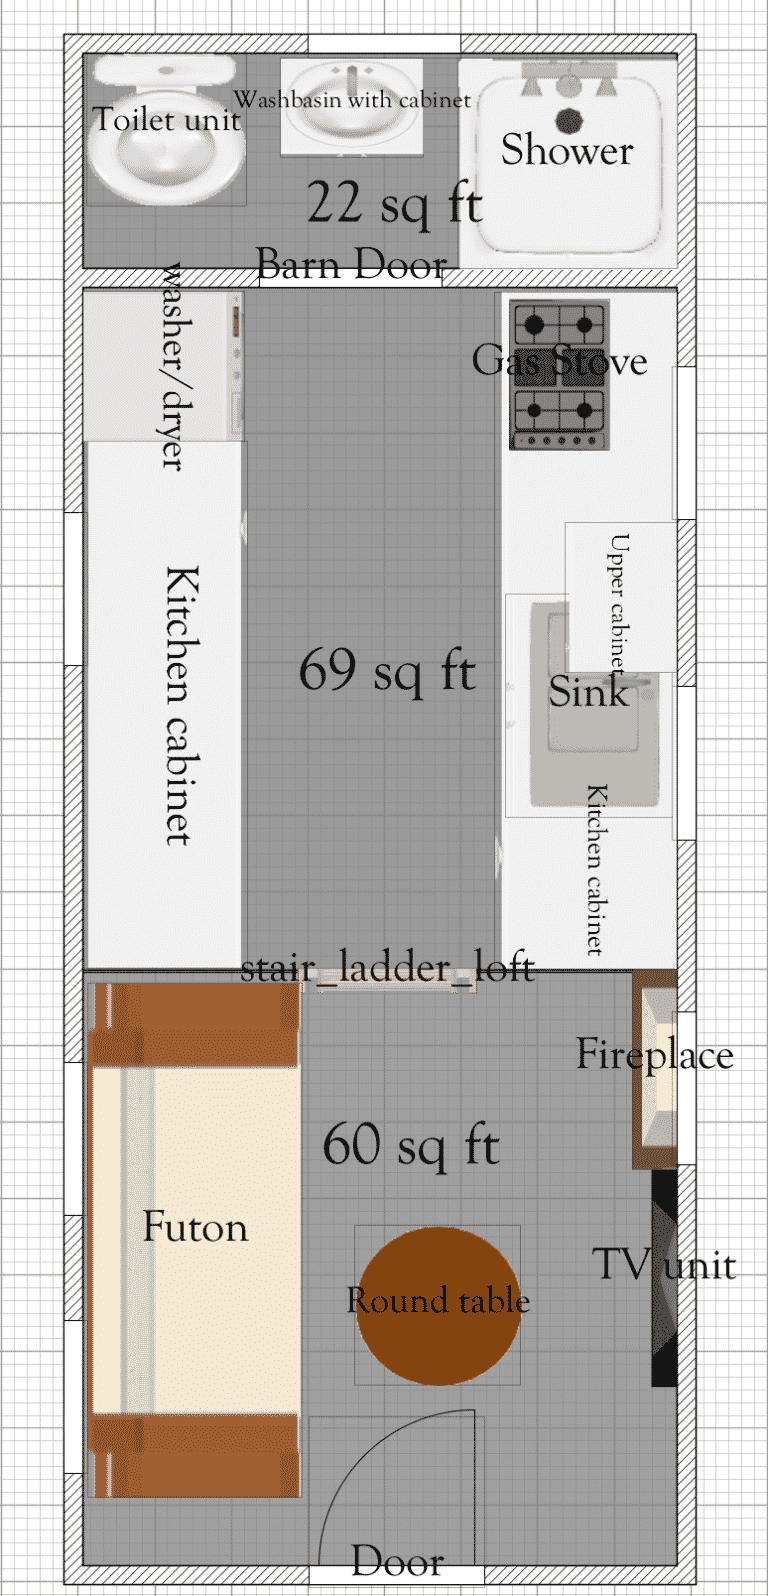 Free Tiny House Floor Plans 8 X 20 Tiny House Plan Tiny House Floor Plans Tiny House Plans Tiny House Plan